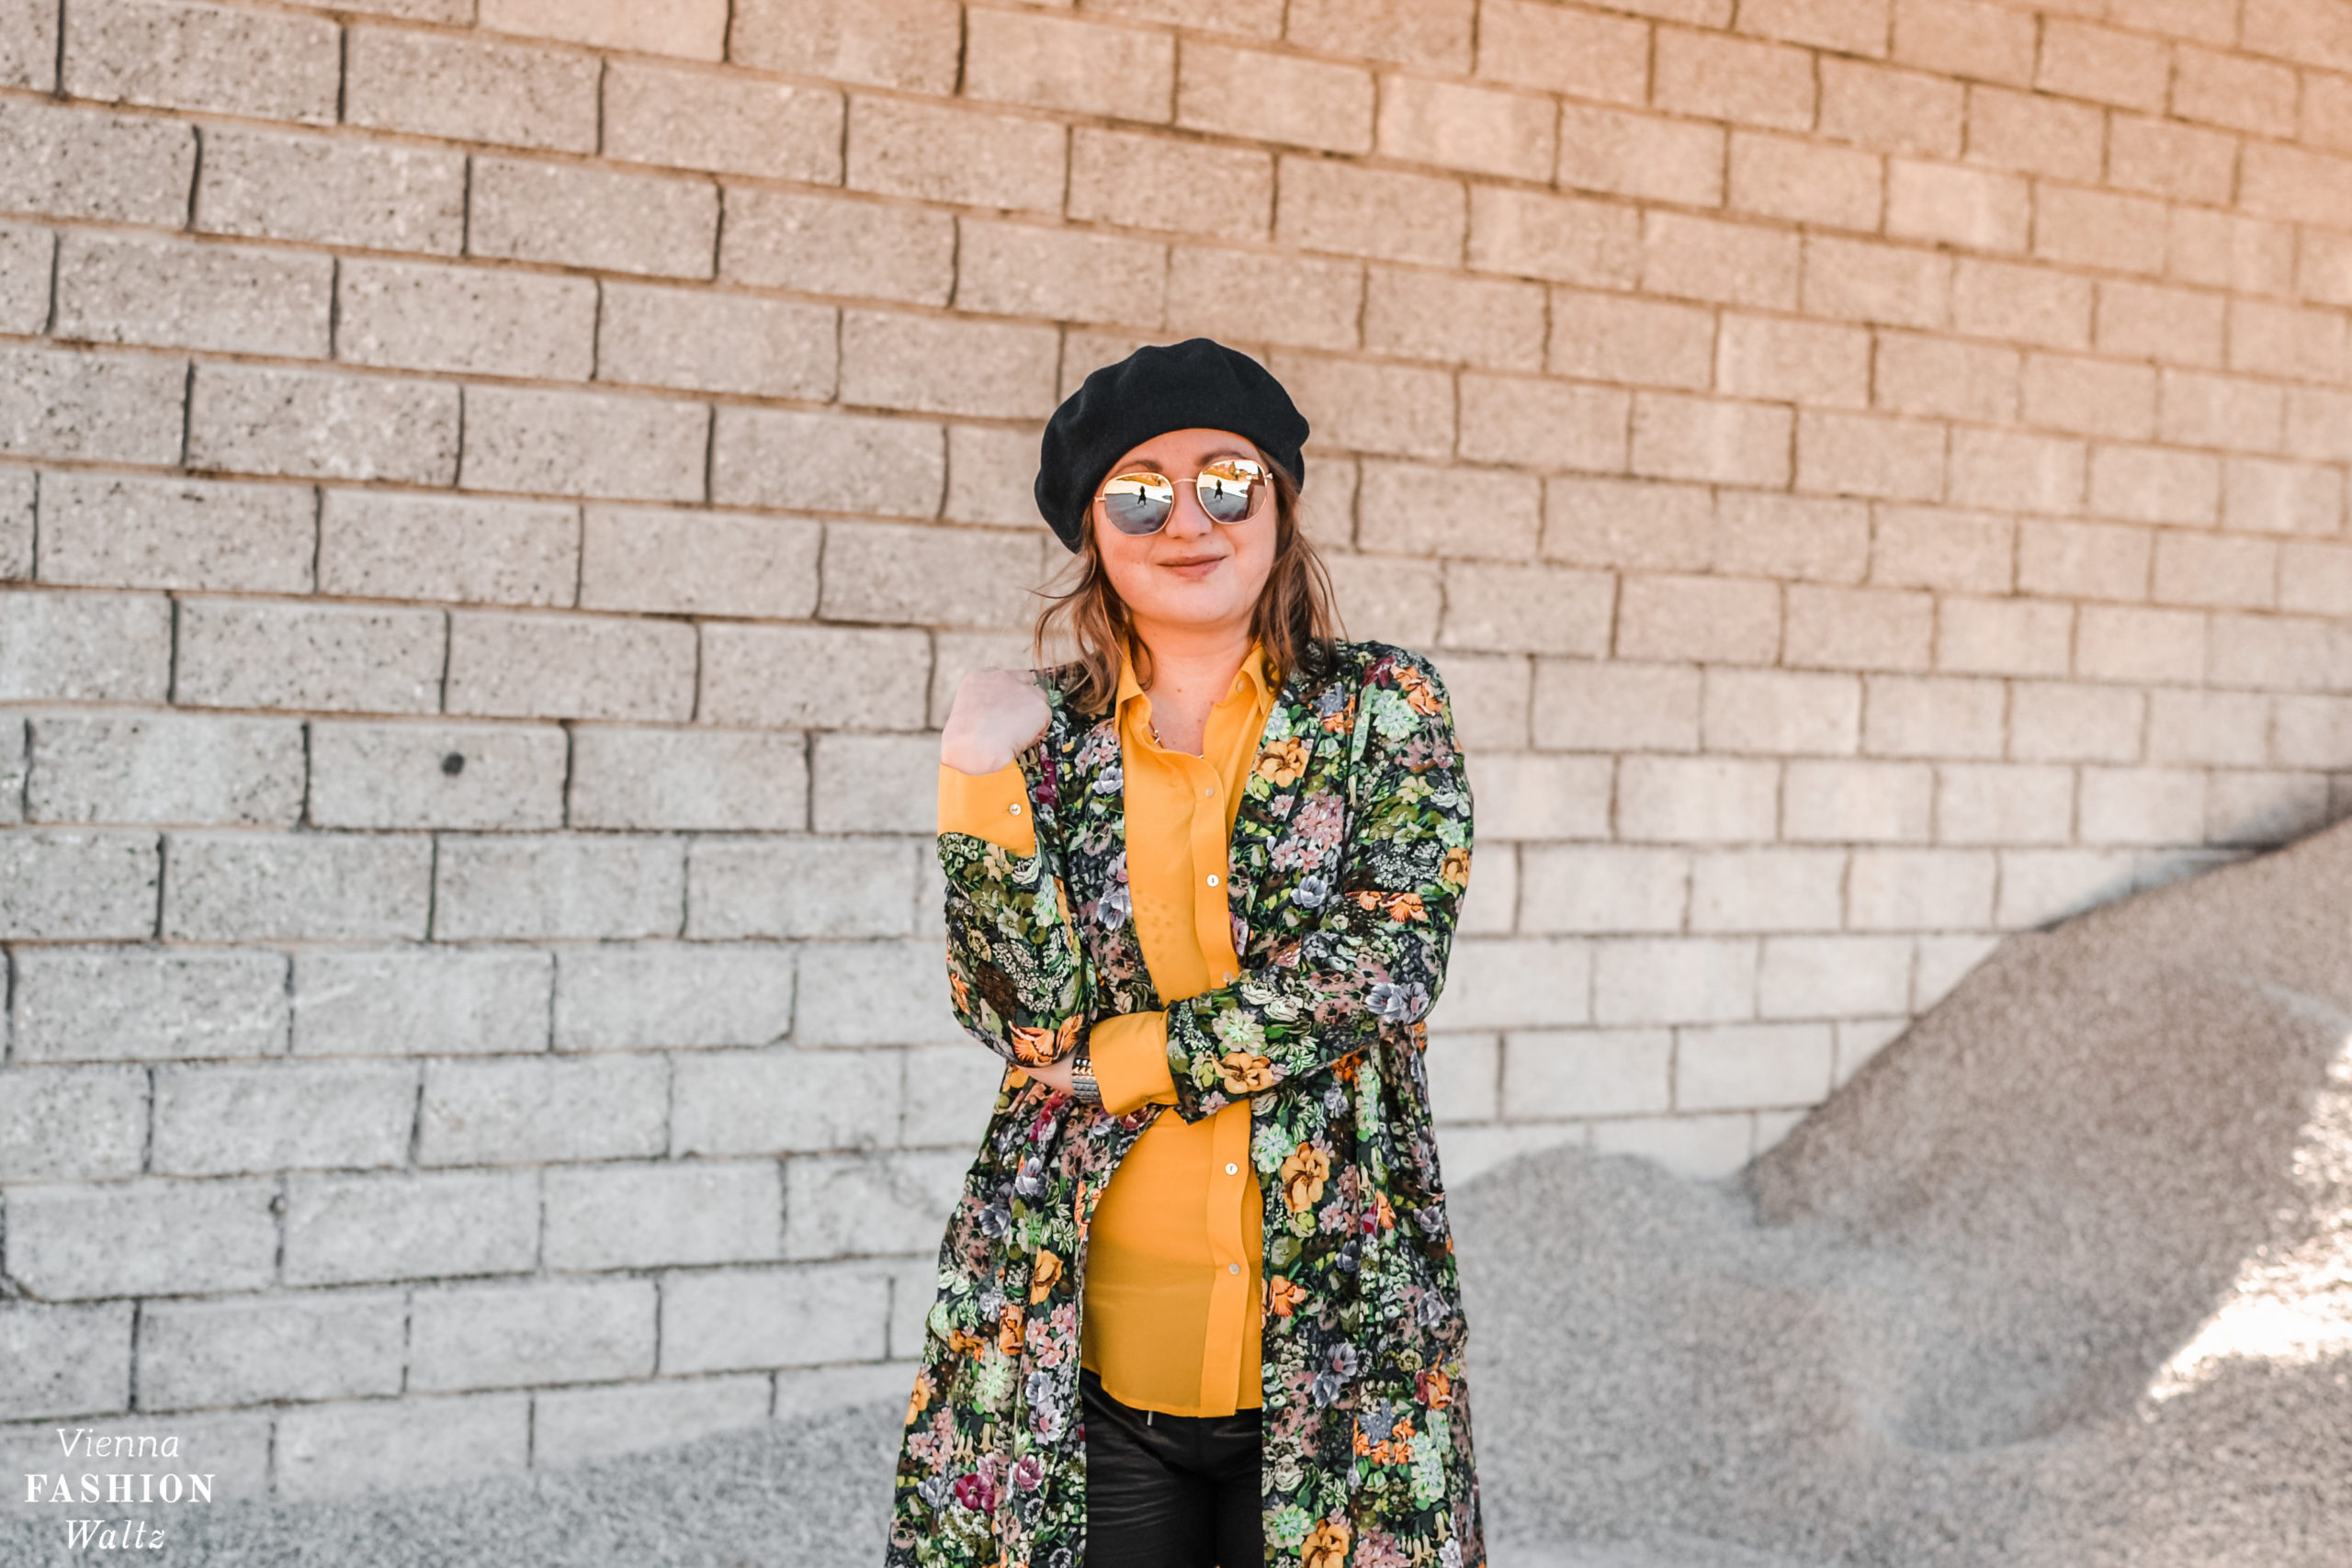 Fashiontrend Jogginghose aus Leder mit floralem Overshirt, Fashion, Style, outfit, ootd, inspo, blogger,Zara, Mango, Sonnenbrille, gelbe Seidenbluse